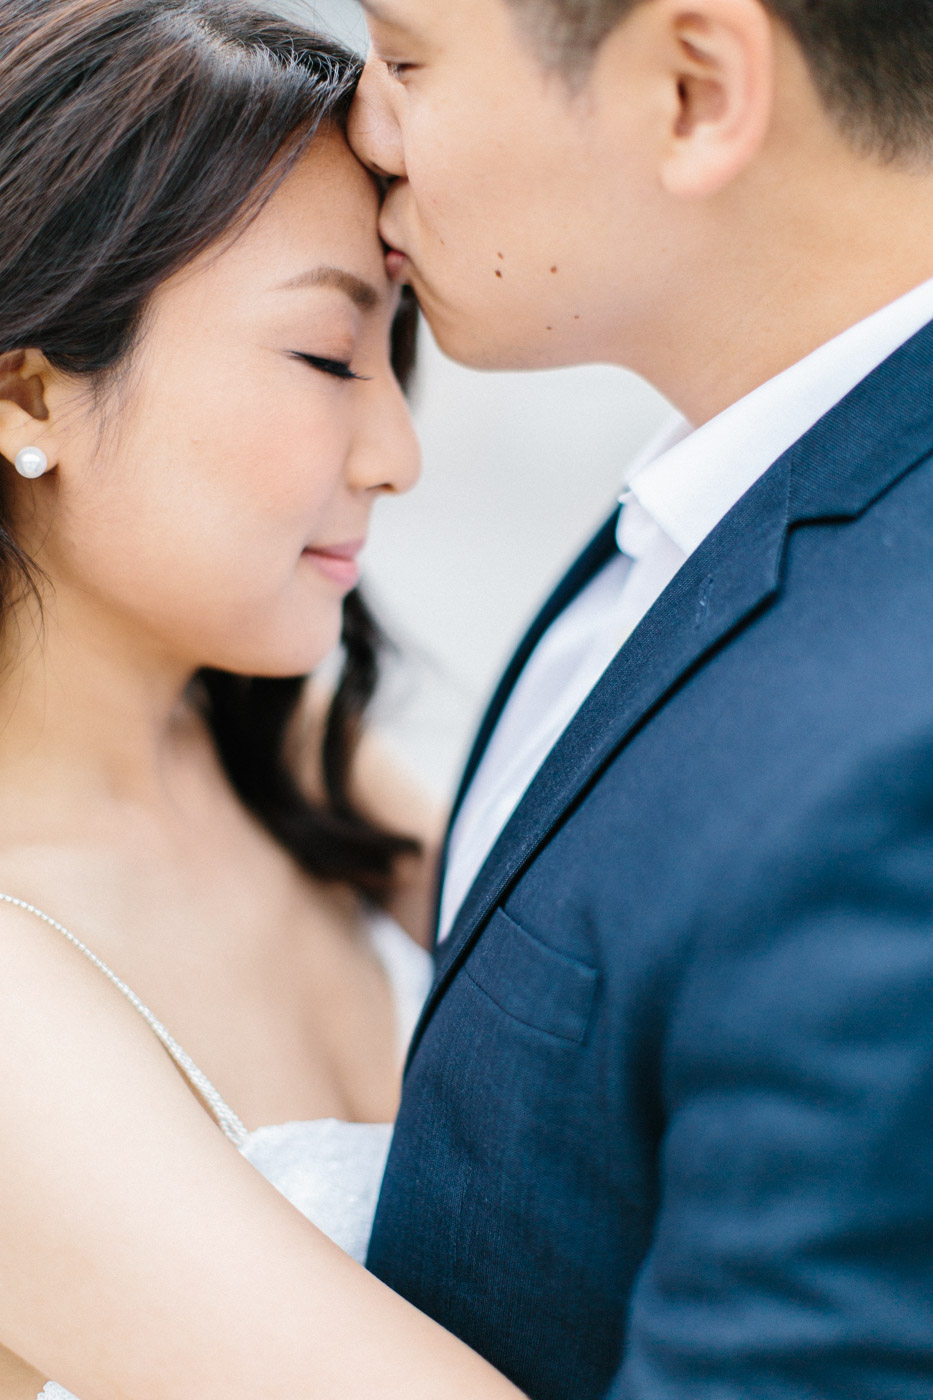 toronto_wedding_photographer_fine_art_documentary 2017-102.jpg